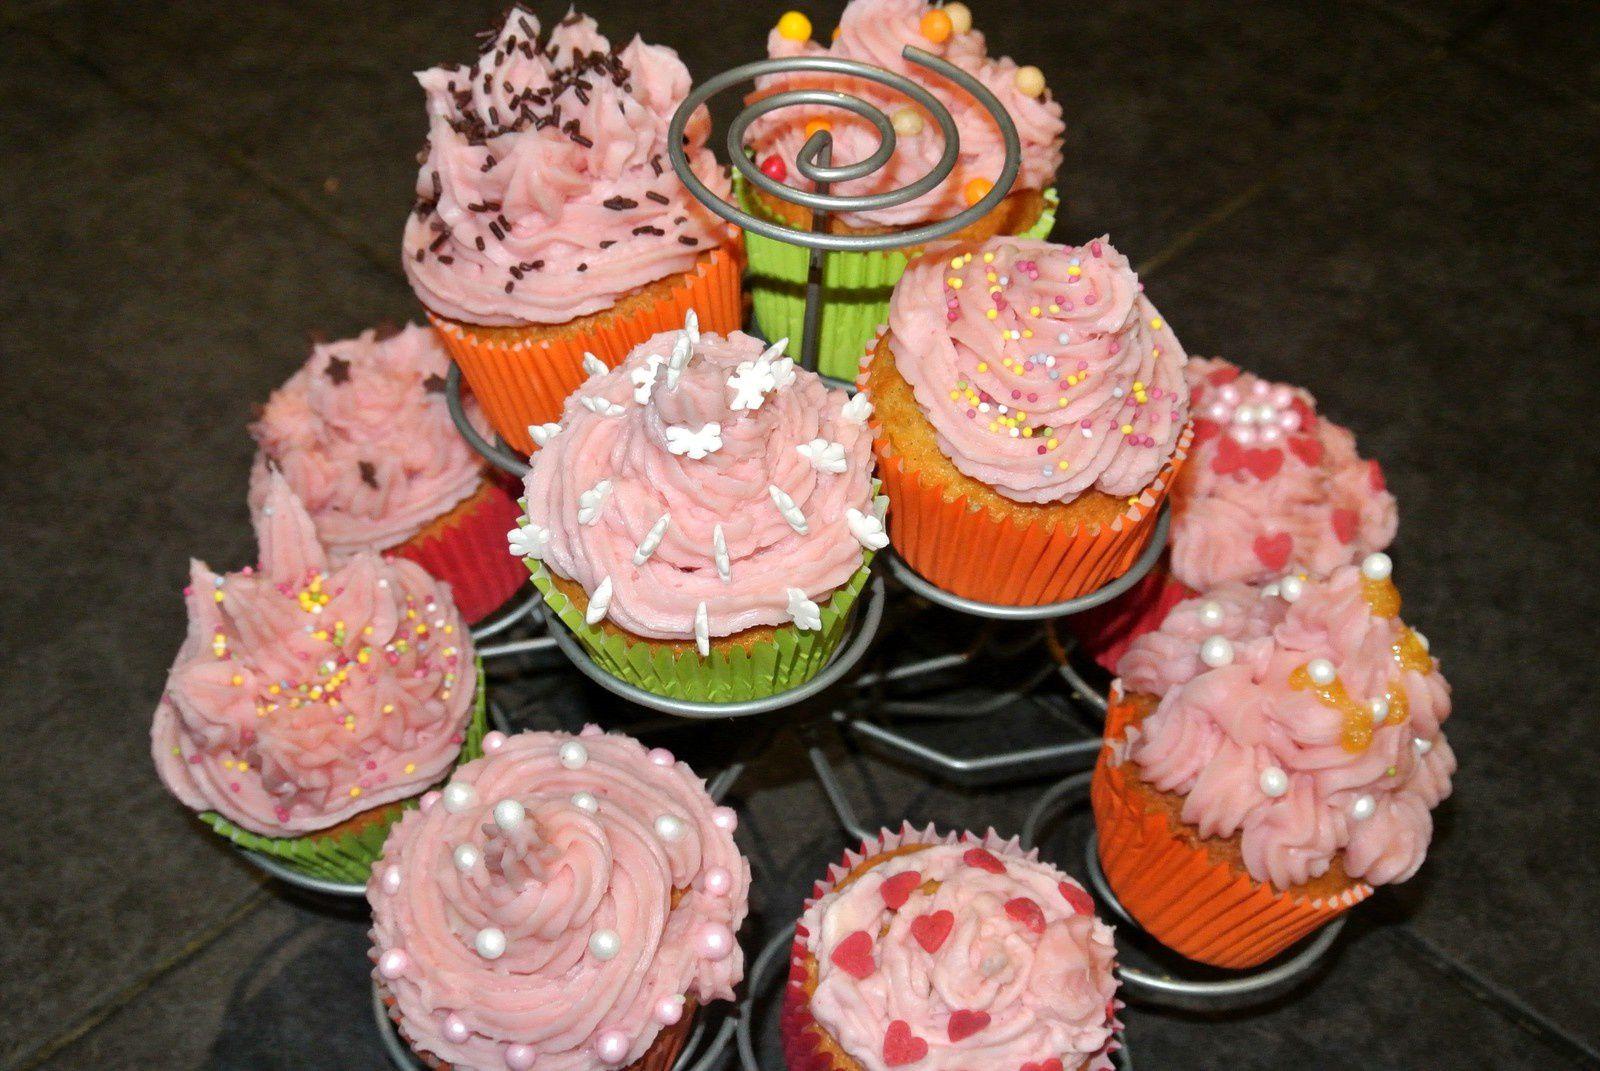 Cupcakes au beurre demi-sel